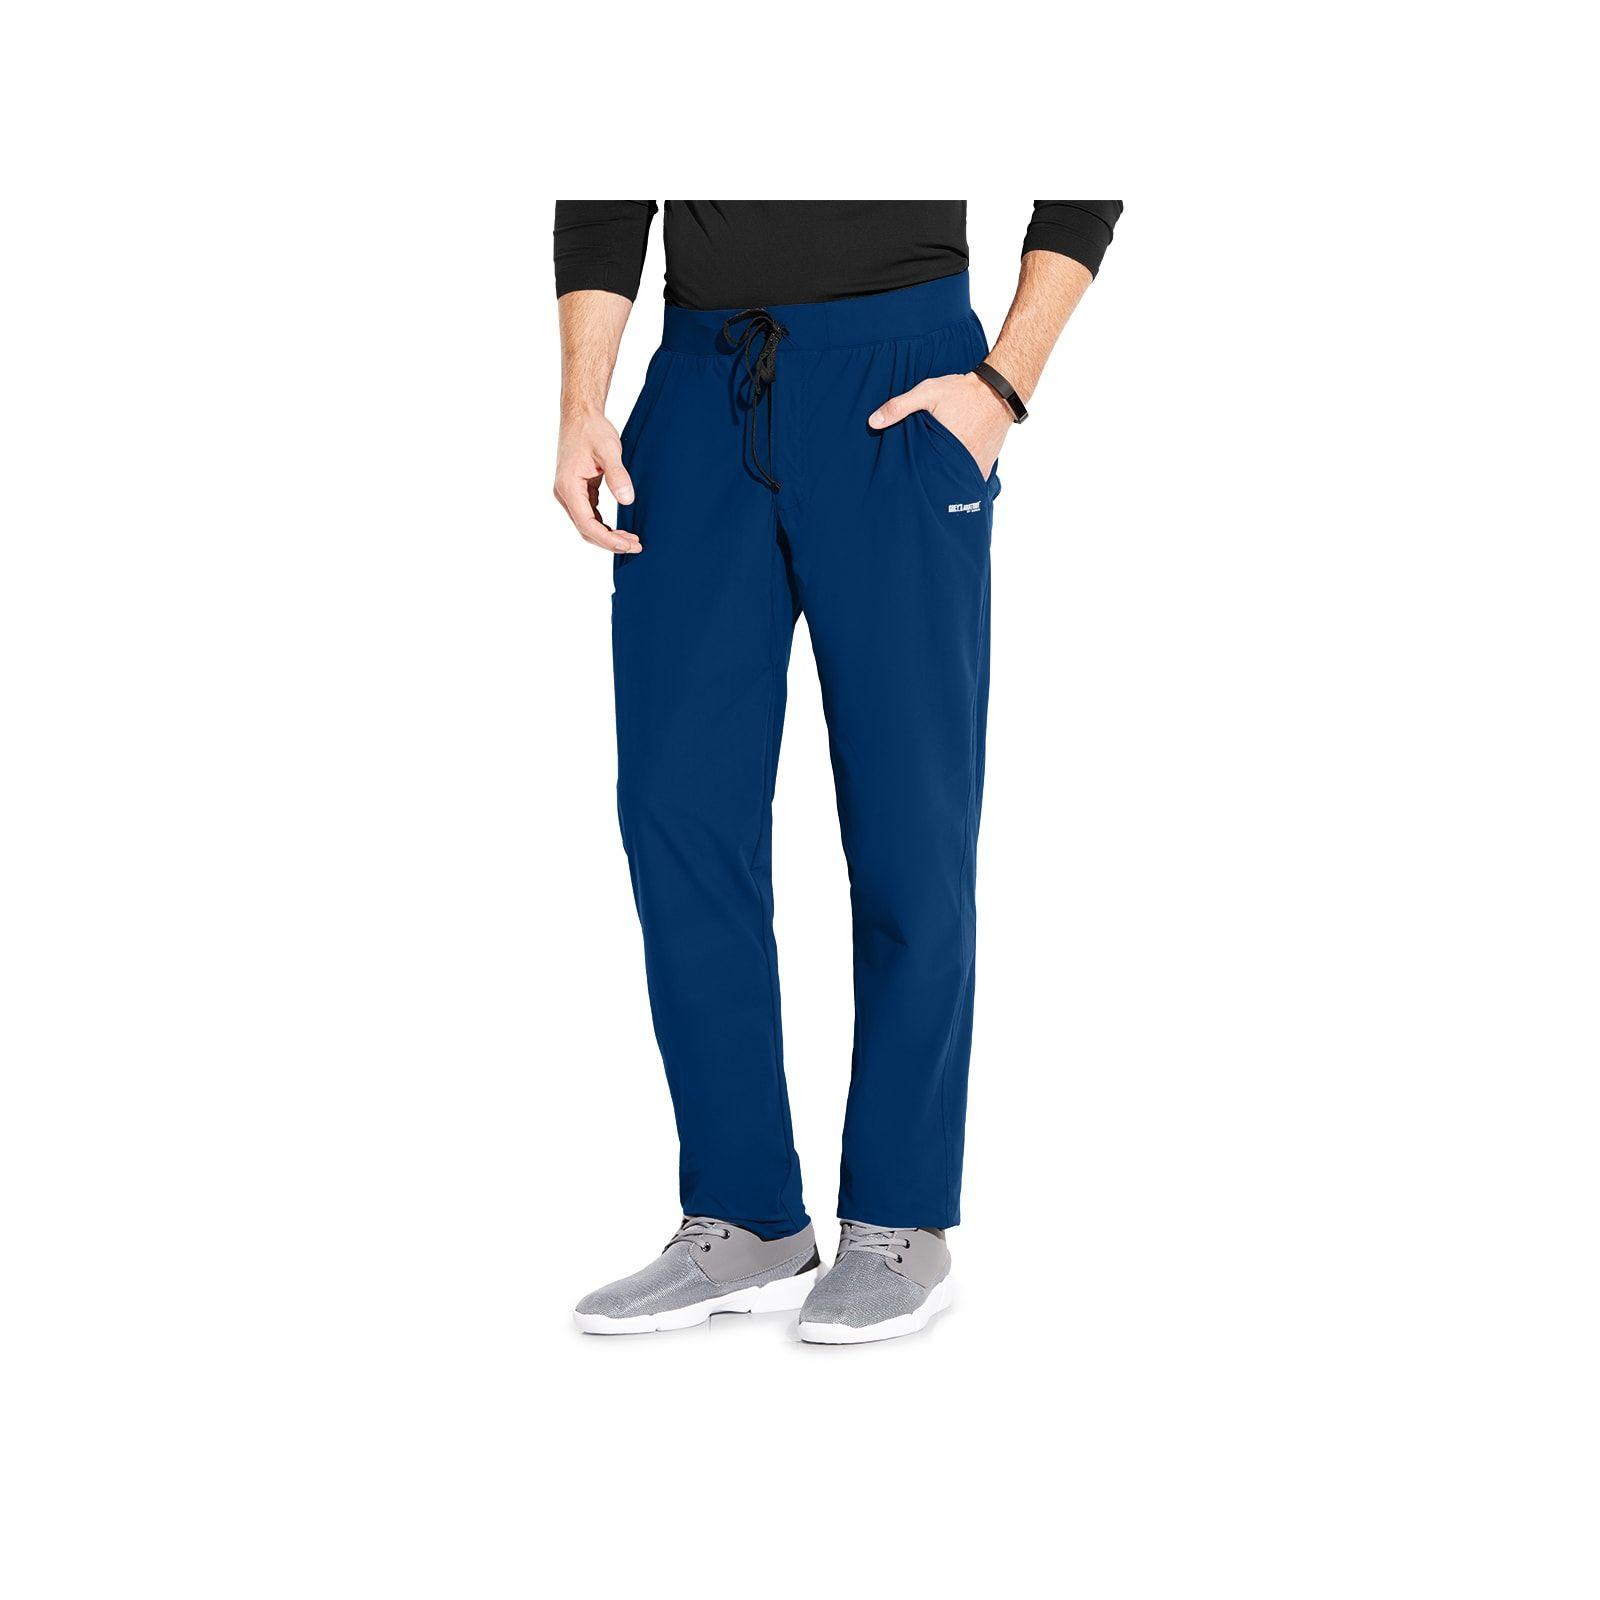 Pantalones Medicos Para Mujeres Grey S Anatomy Edge Gep002